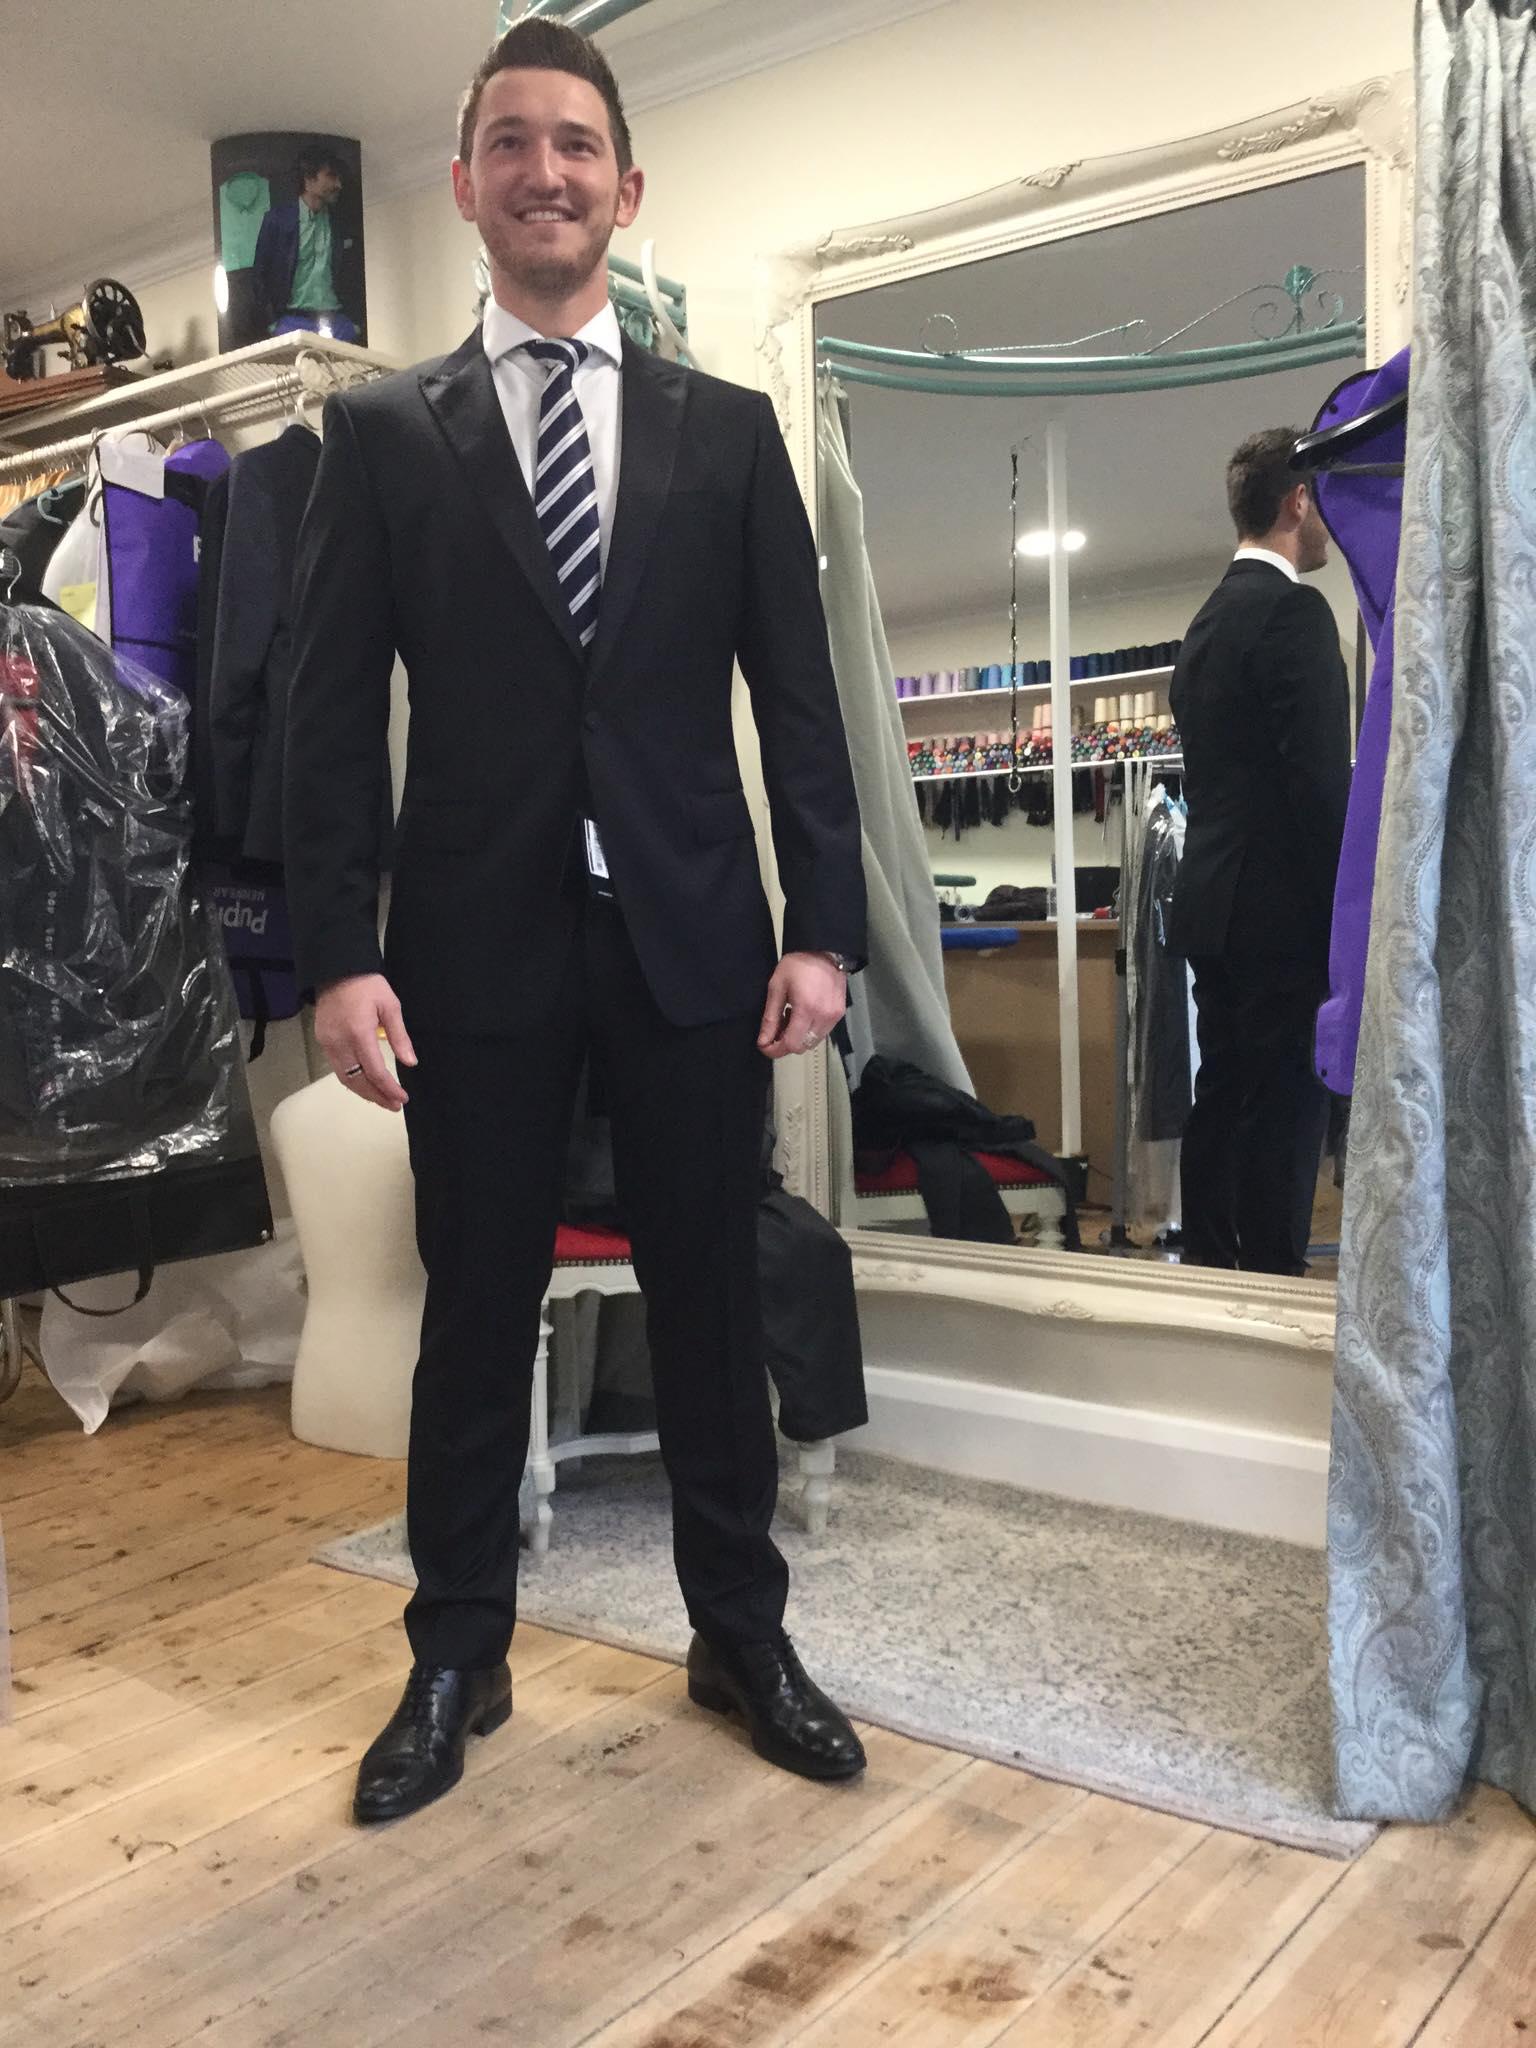 HBoss suit alteration